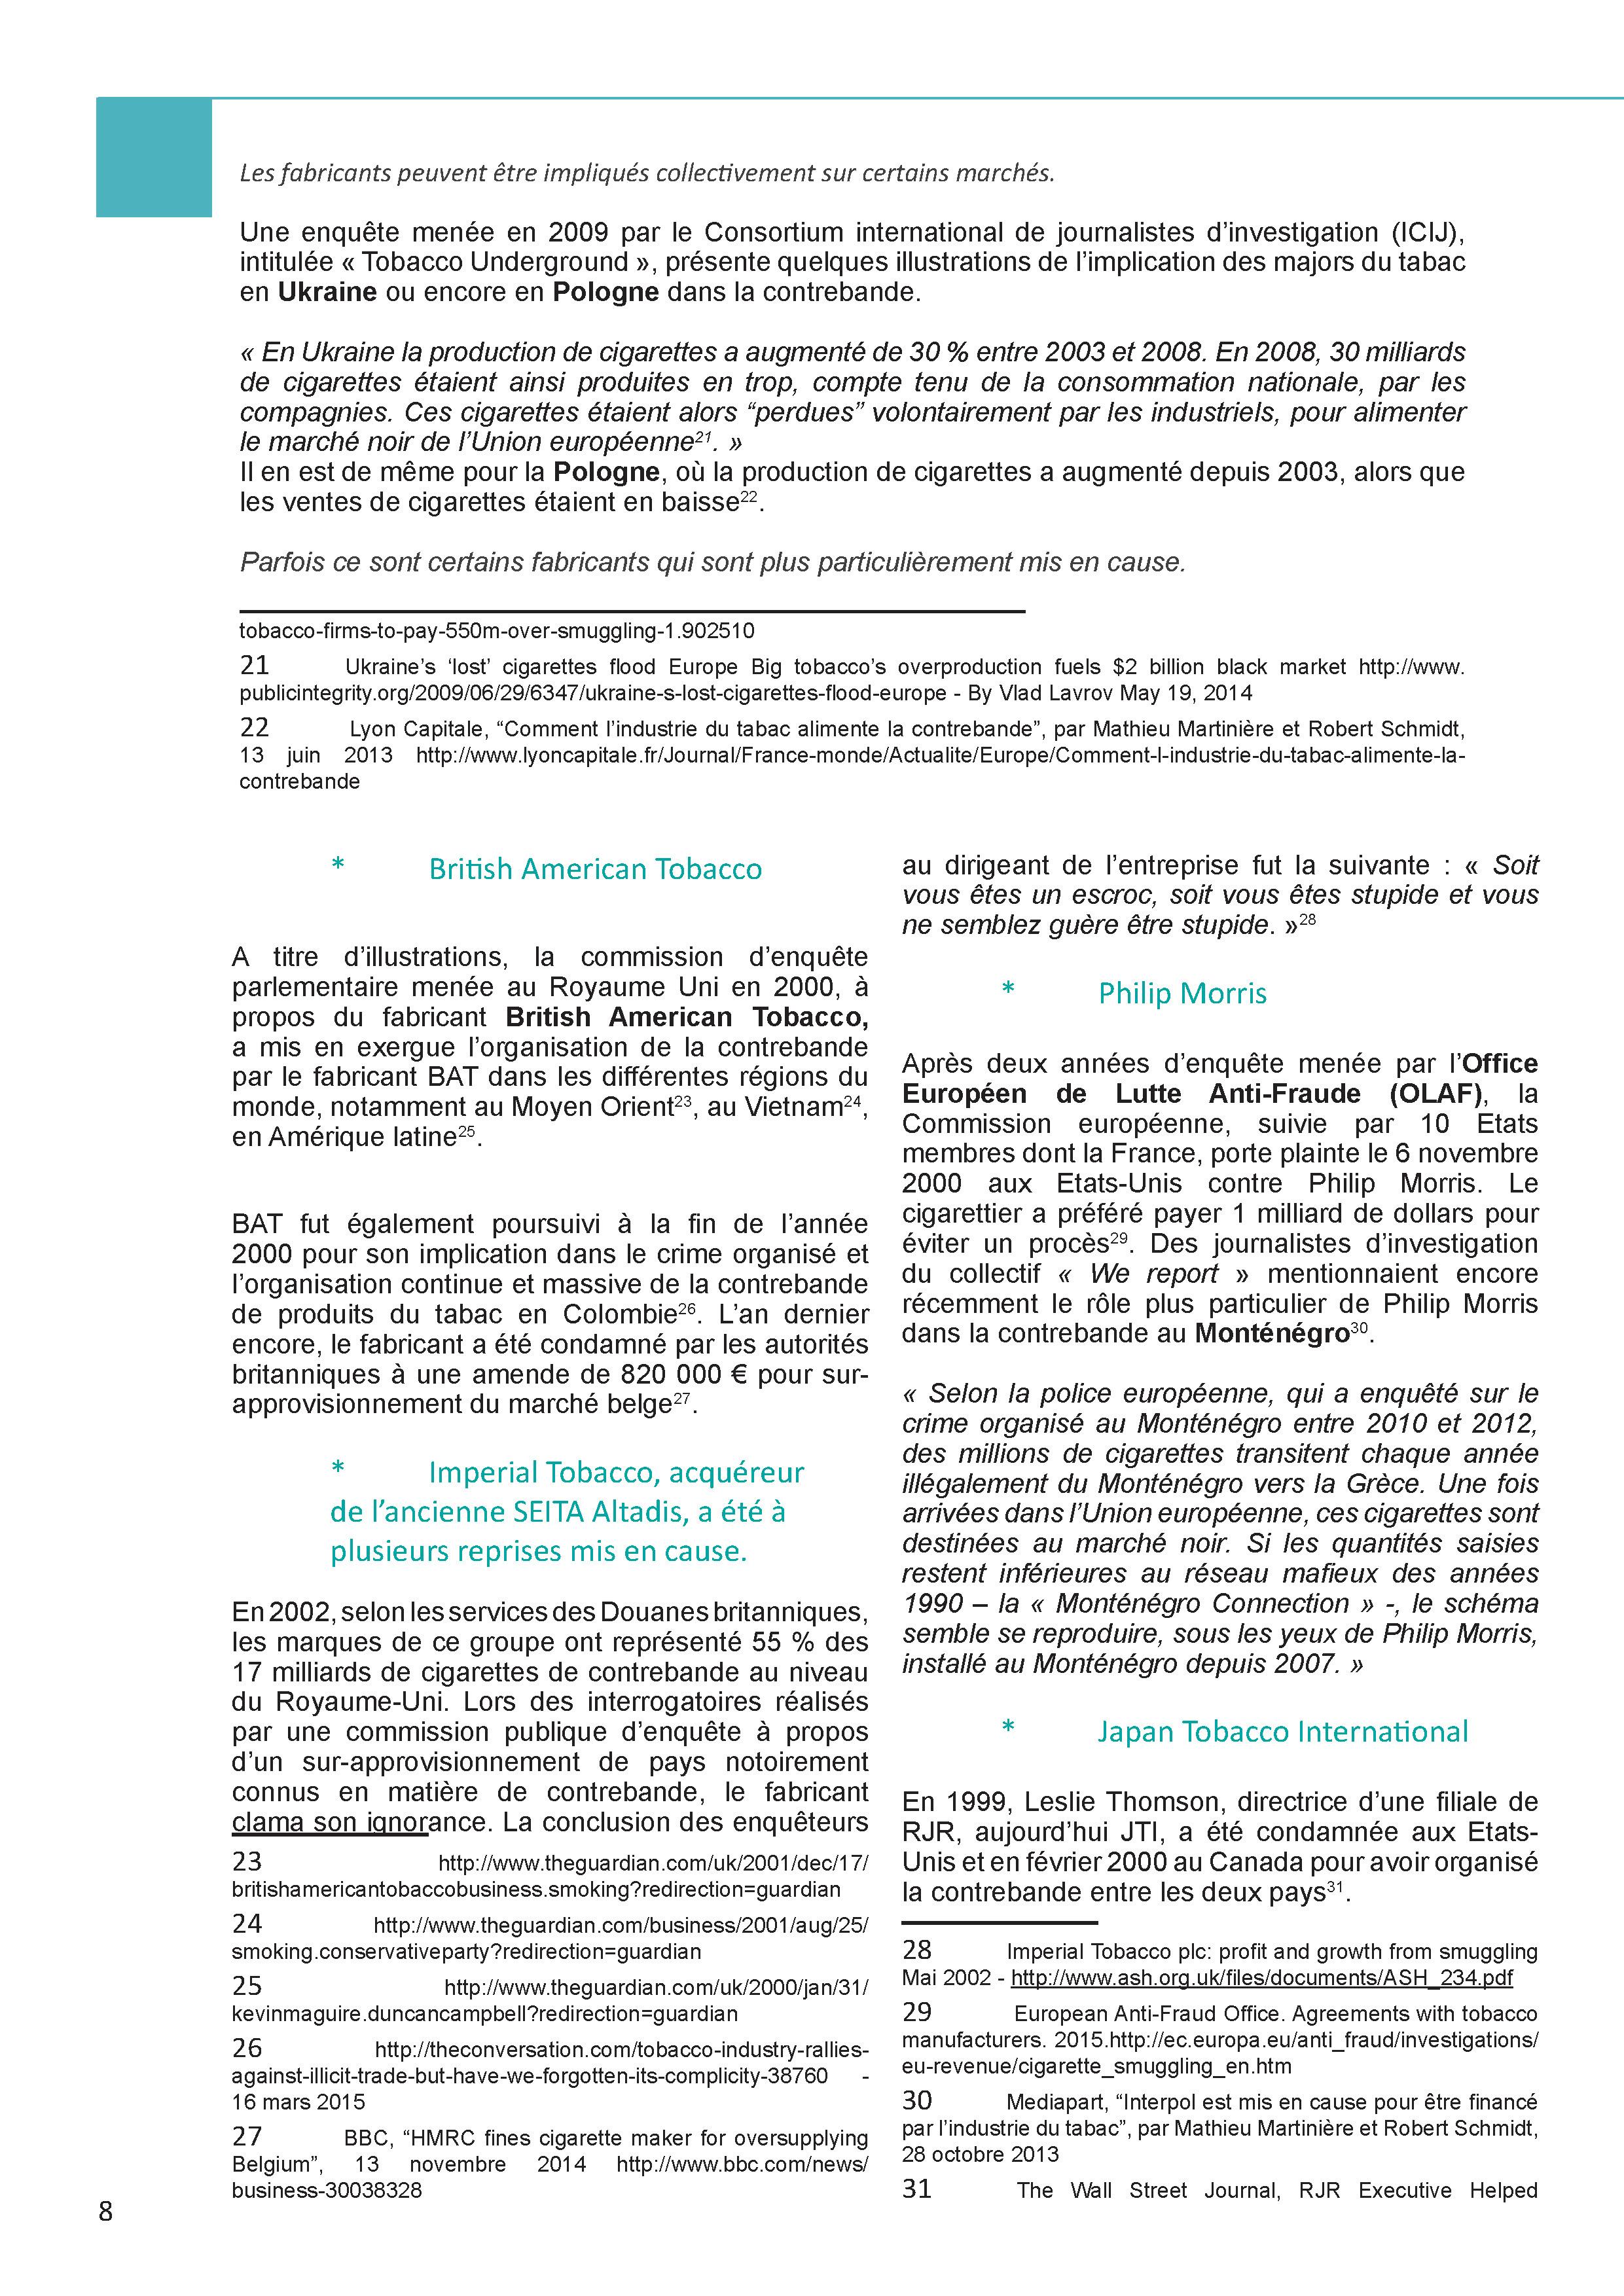 Alliance-DP_commerce-illicite-26mai2015_Page_08.jpg